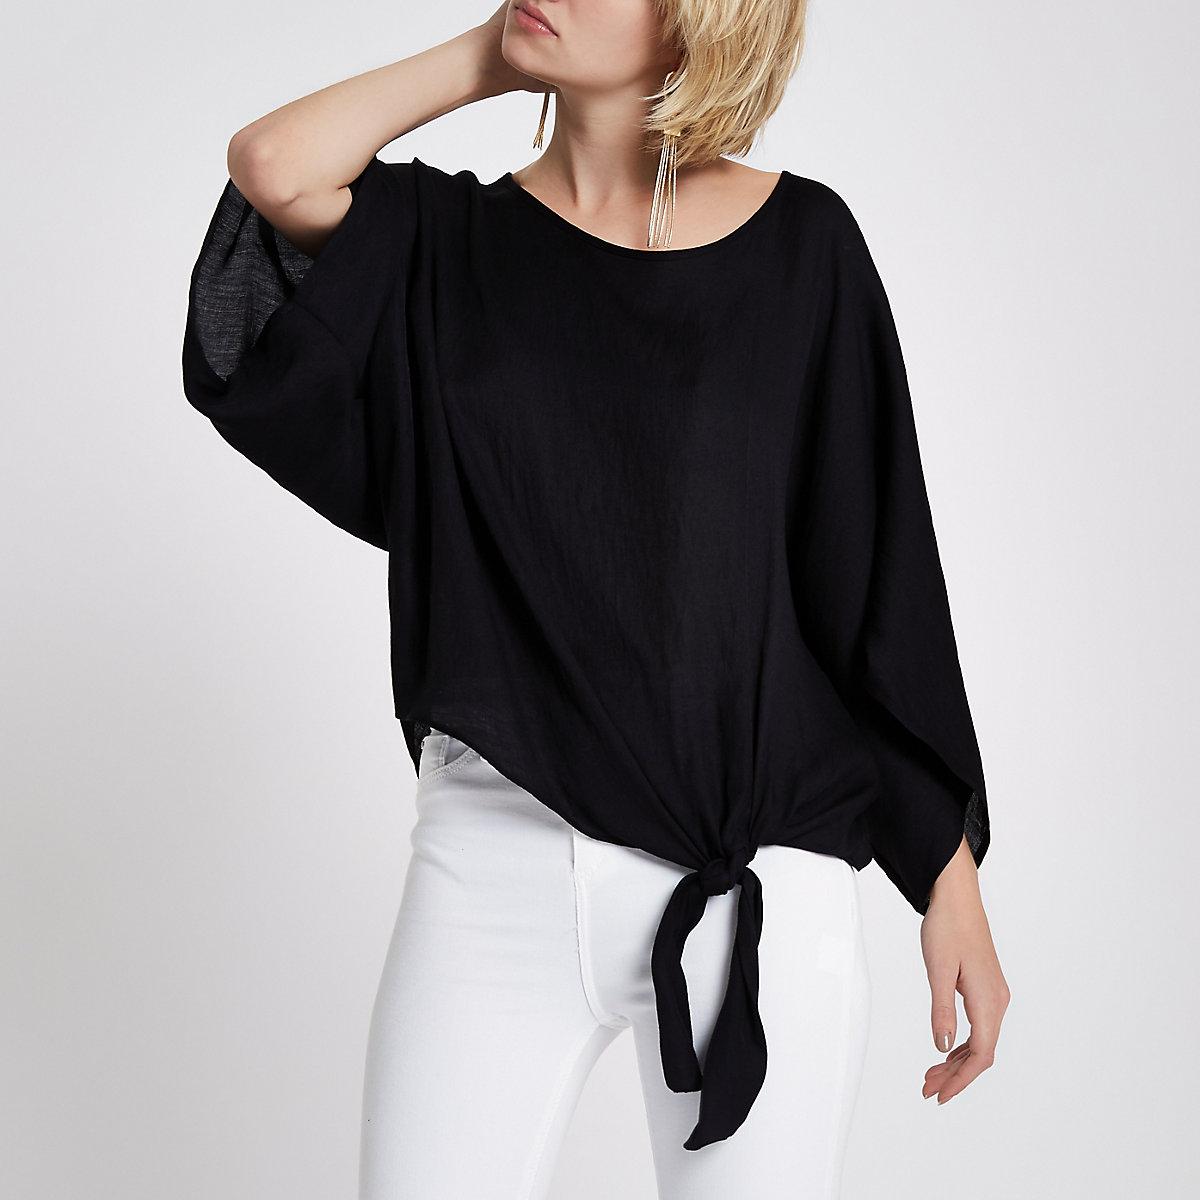 Black knot side T-shirt